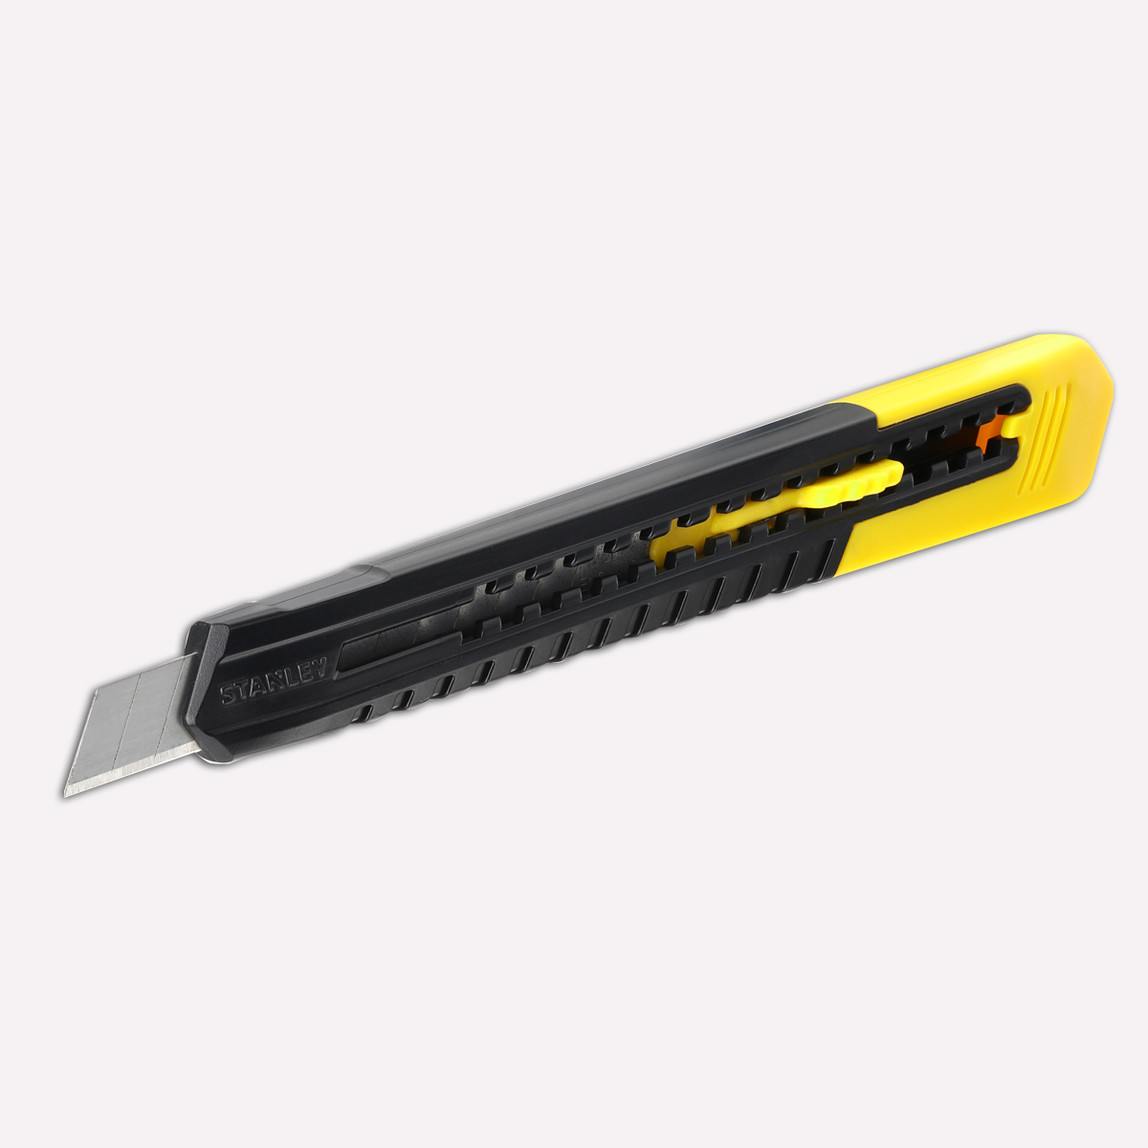 Stanley 1-10-150 SM Ayarlı Maket Bıçağı 9 mm